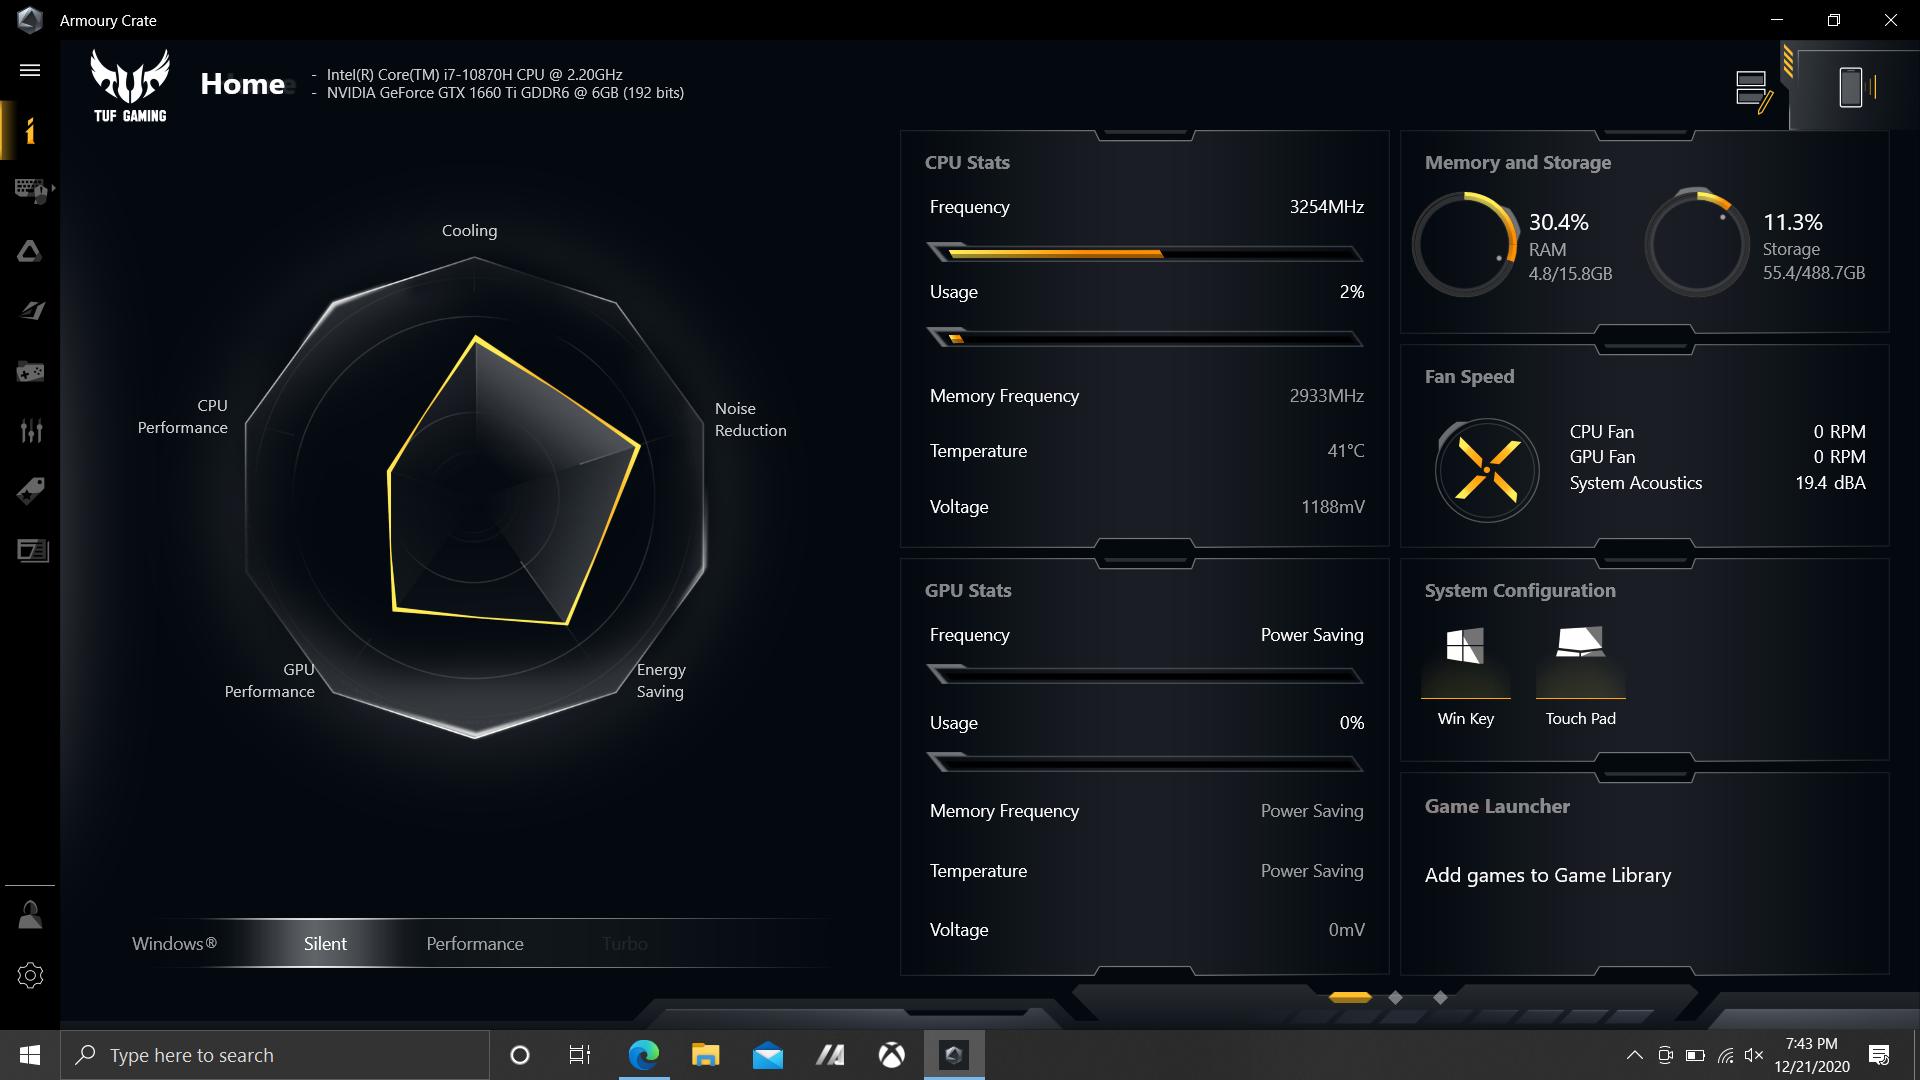 screenshot-9-png.12280